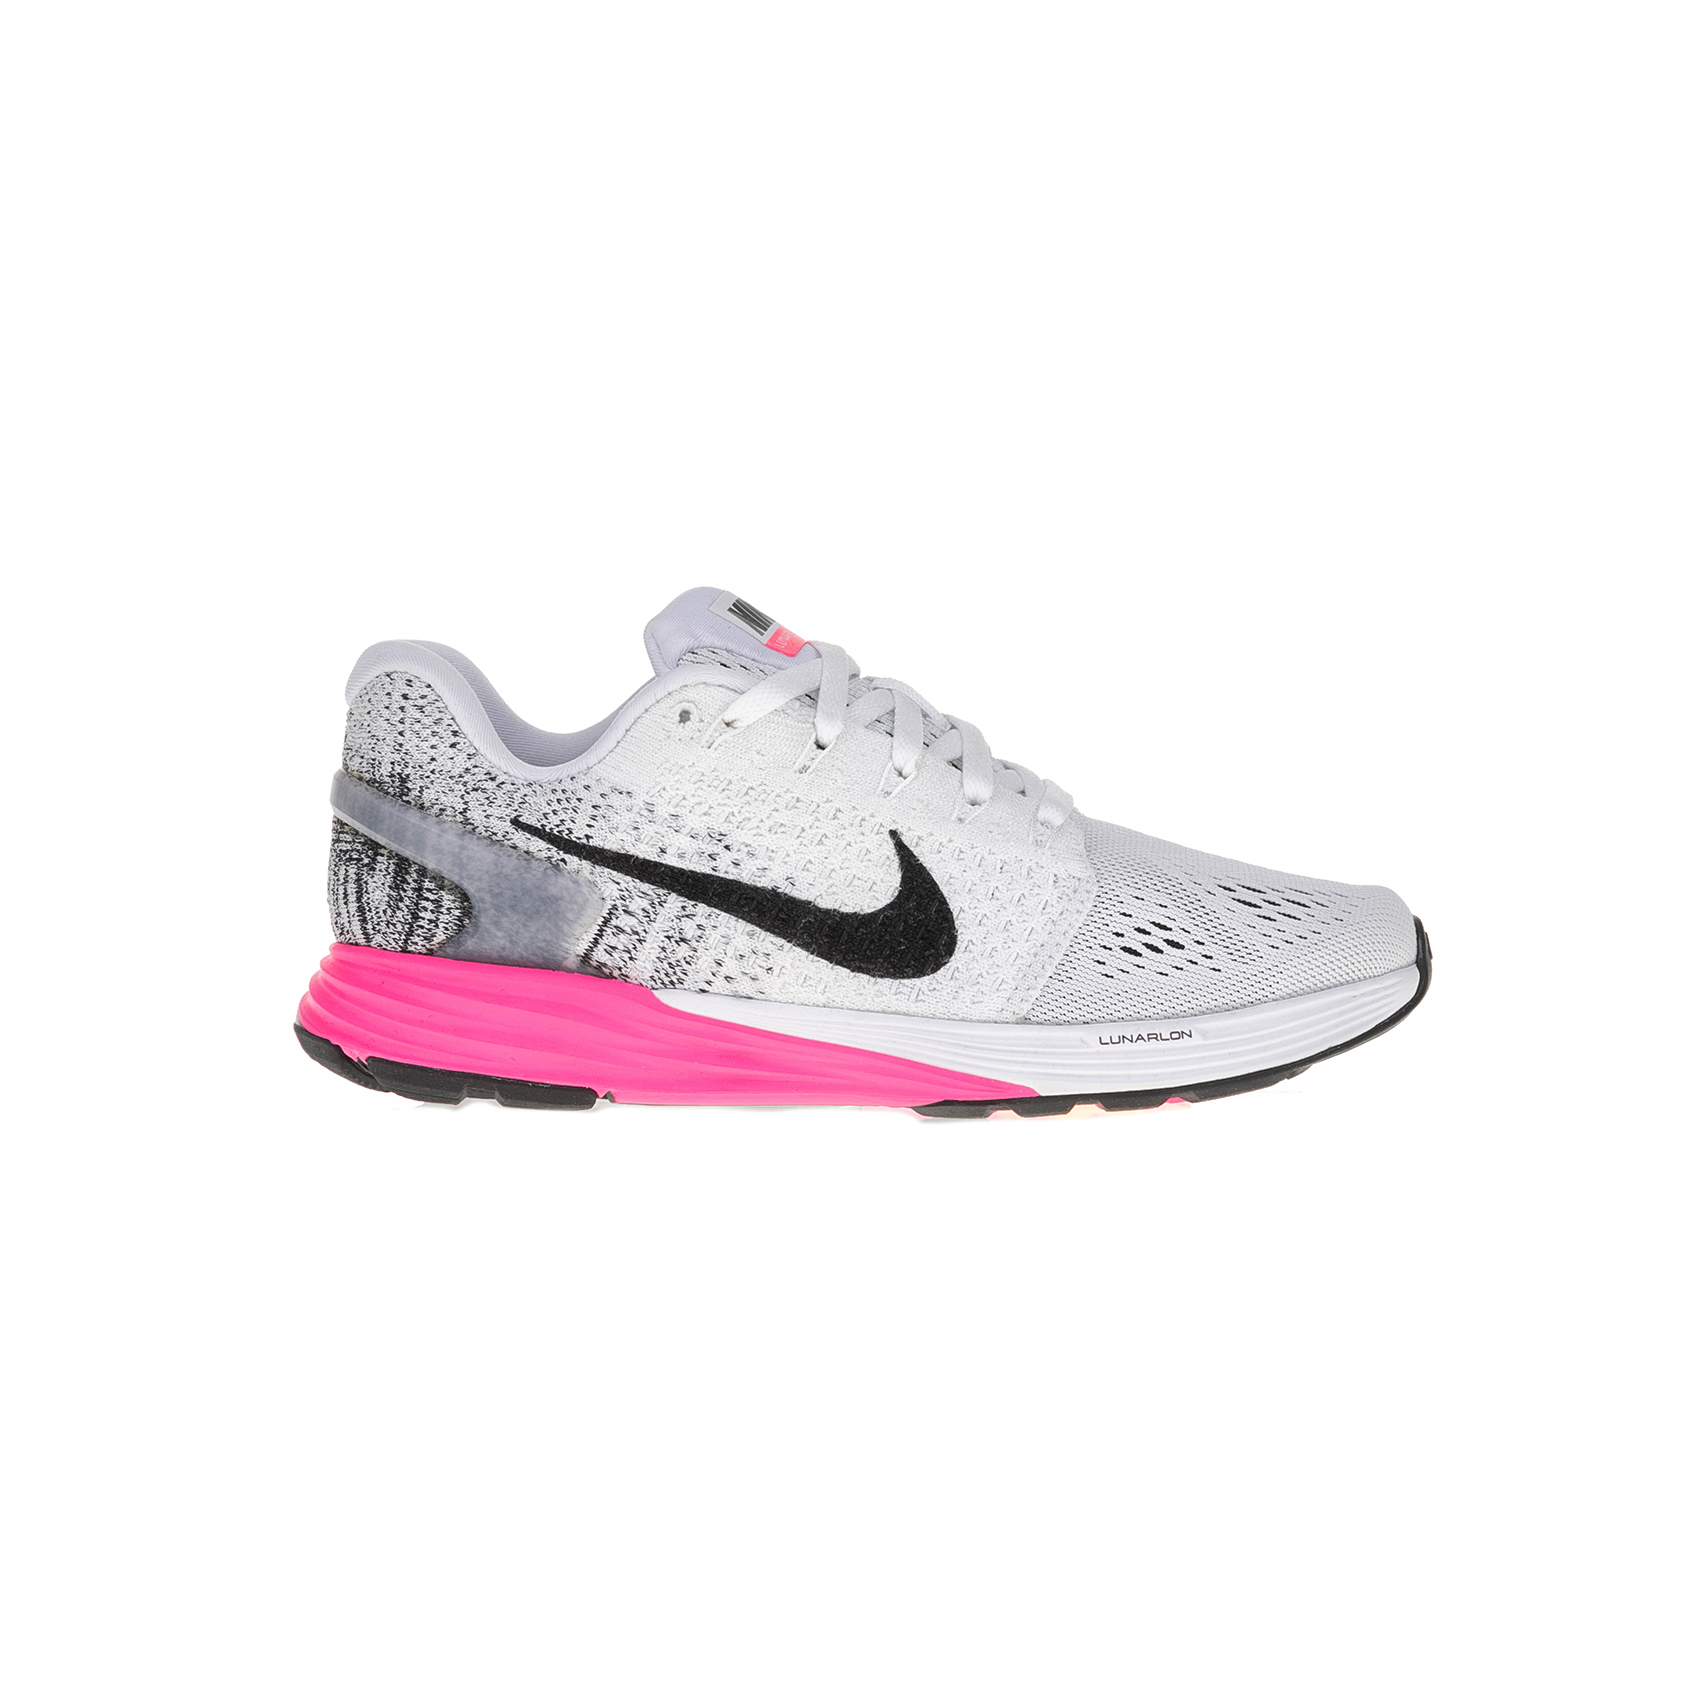 NIKE – Γυναικεία παπούτσια NIKE LUNARGLIDE 7 γκρι-ροζ